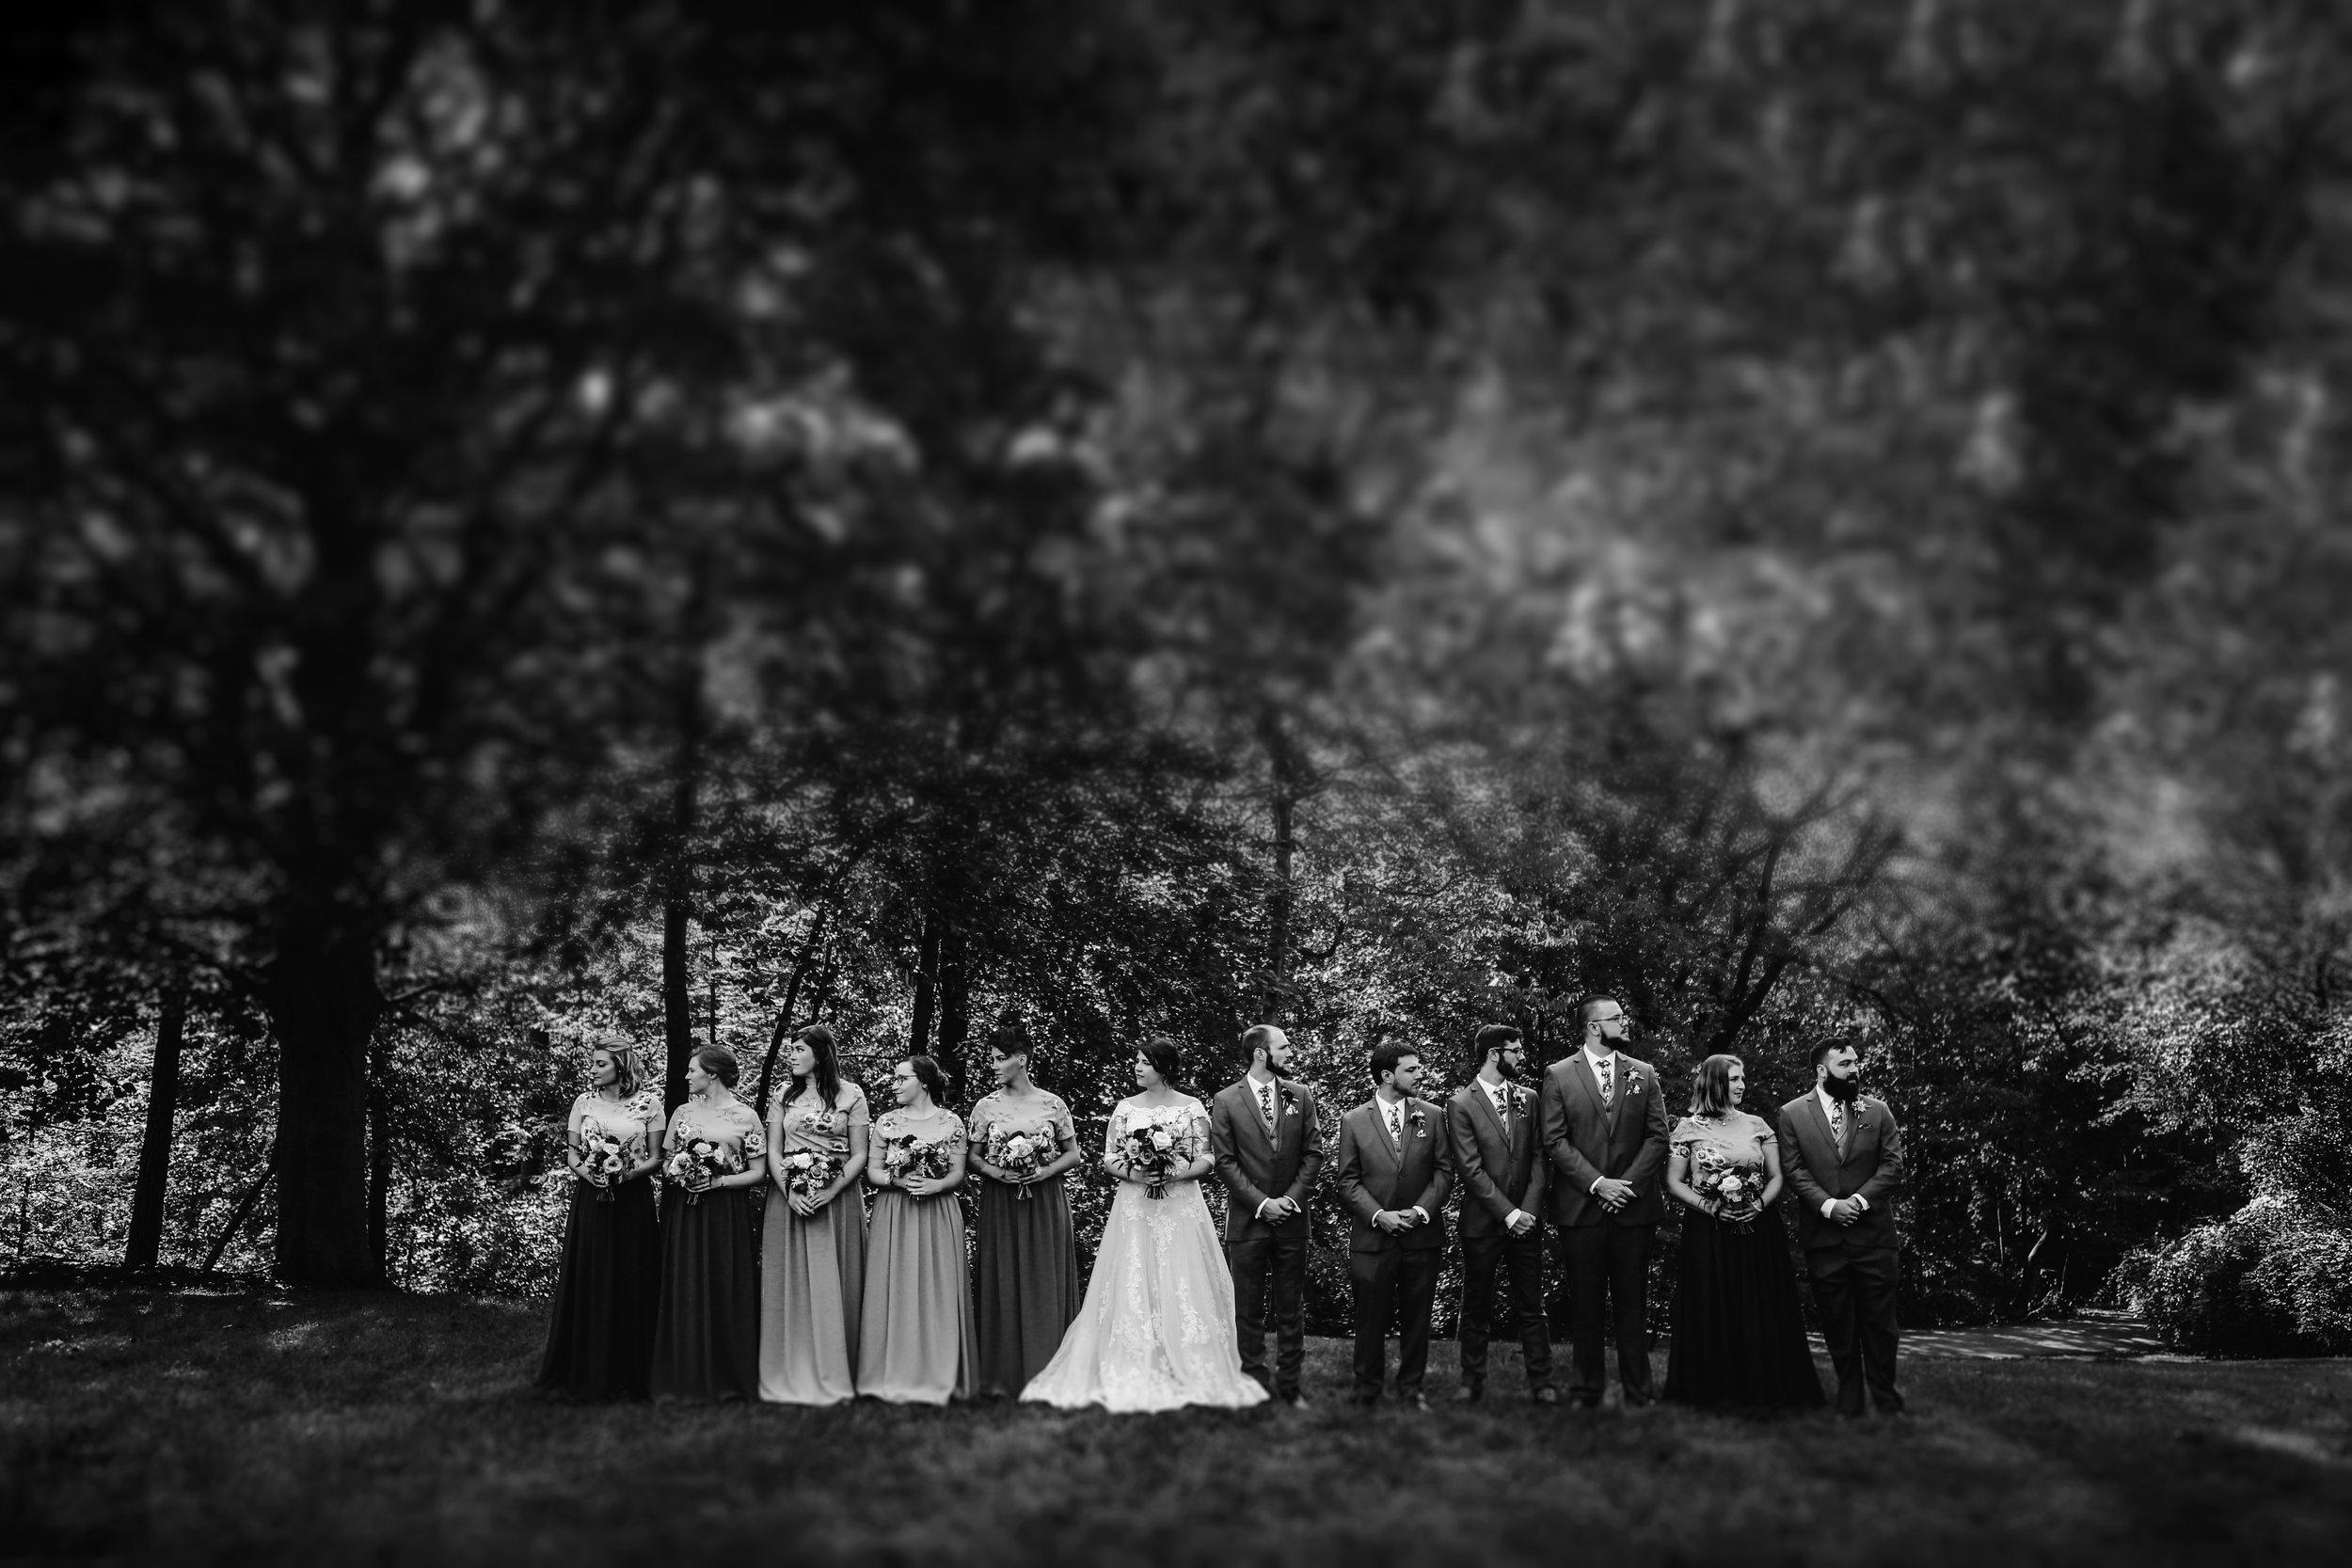 LDP_McNeiveWedding_WeddingParty_003.JPG